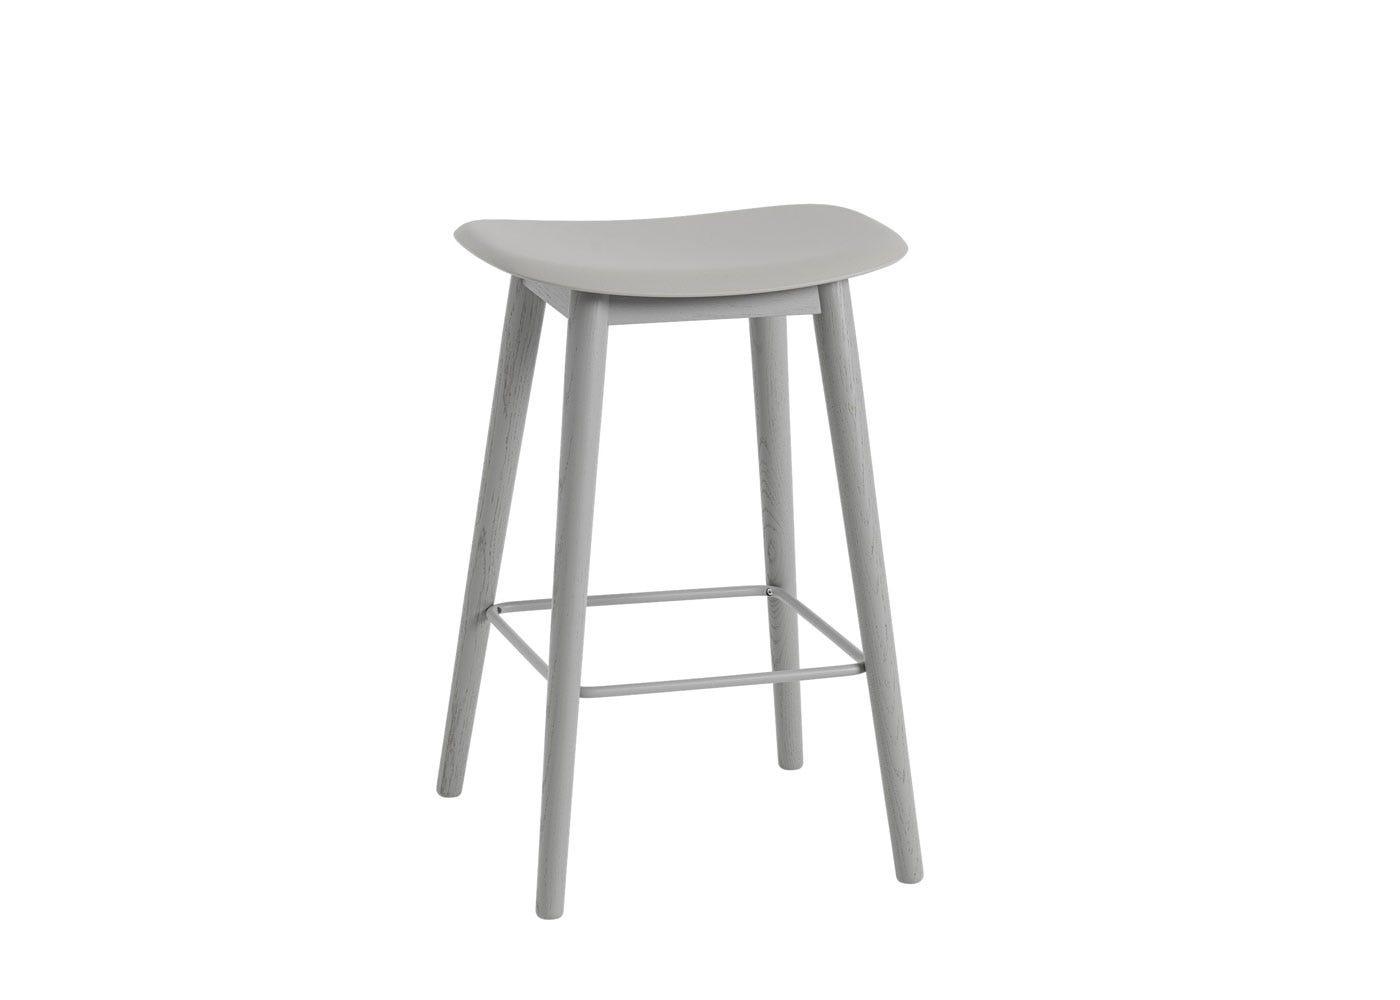 Fiber Counter Stool Without Backrest Wooden Base Grey